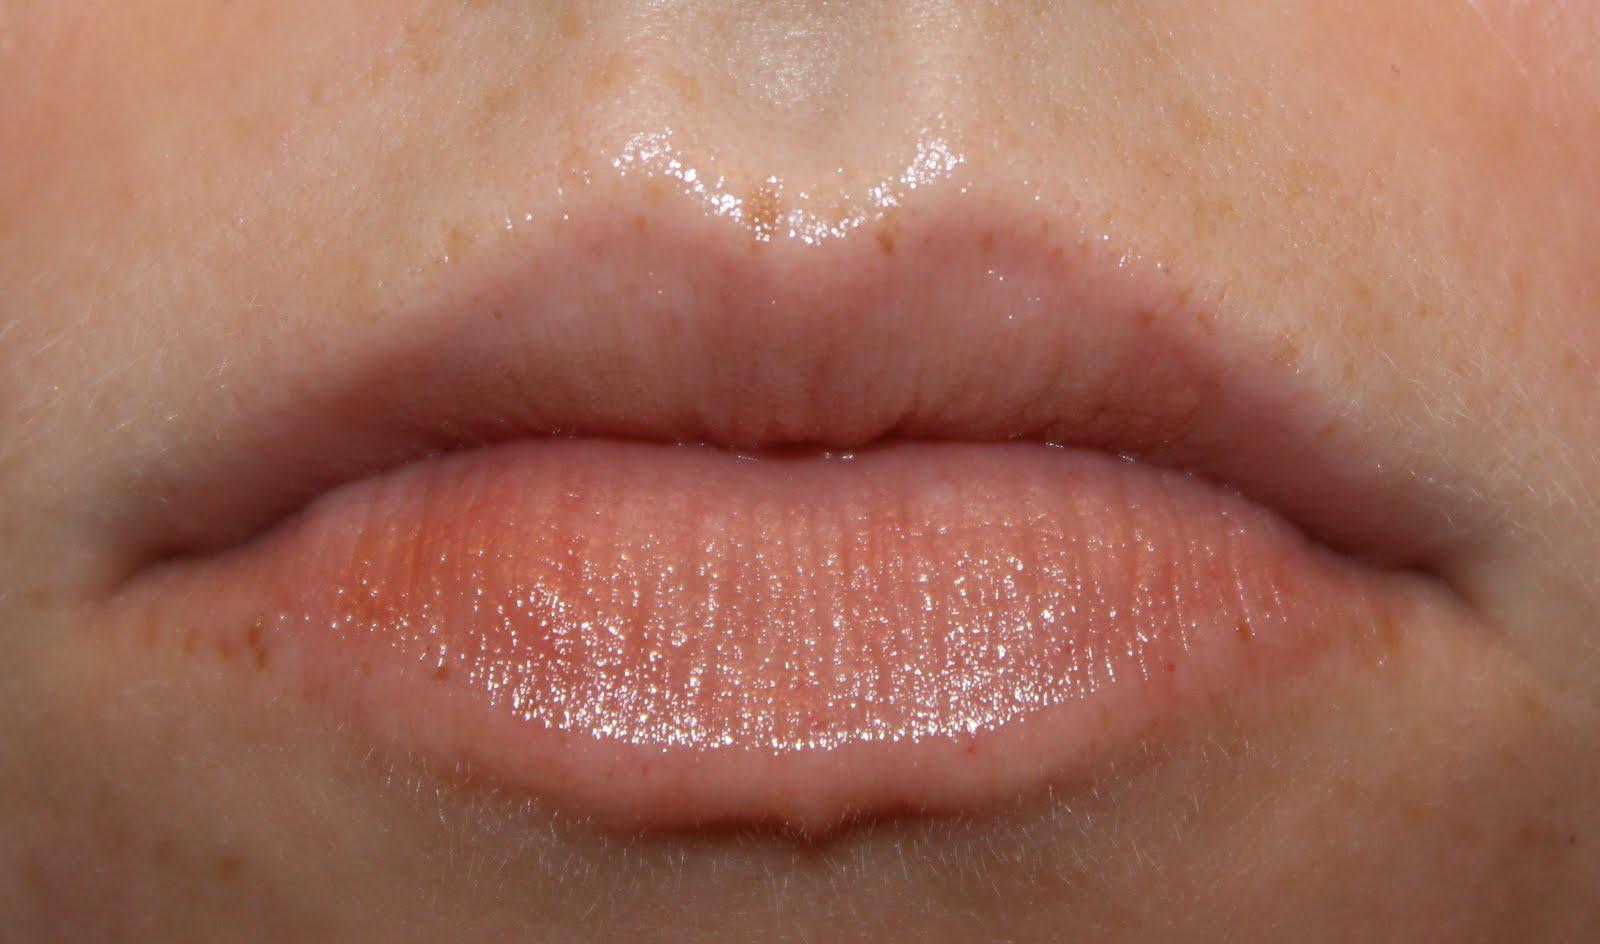 Allergic reaction to lipstick